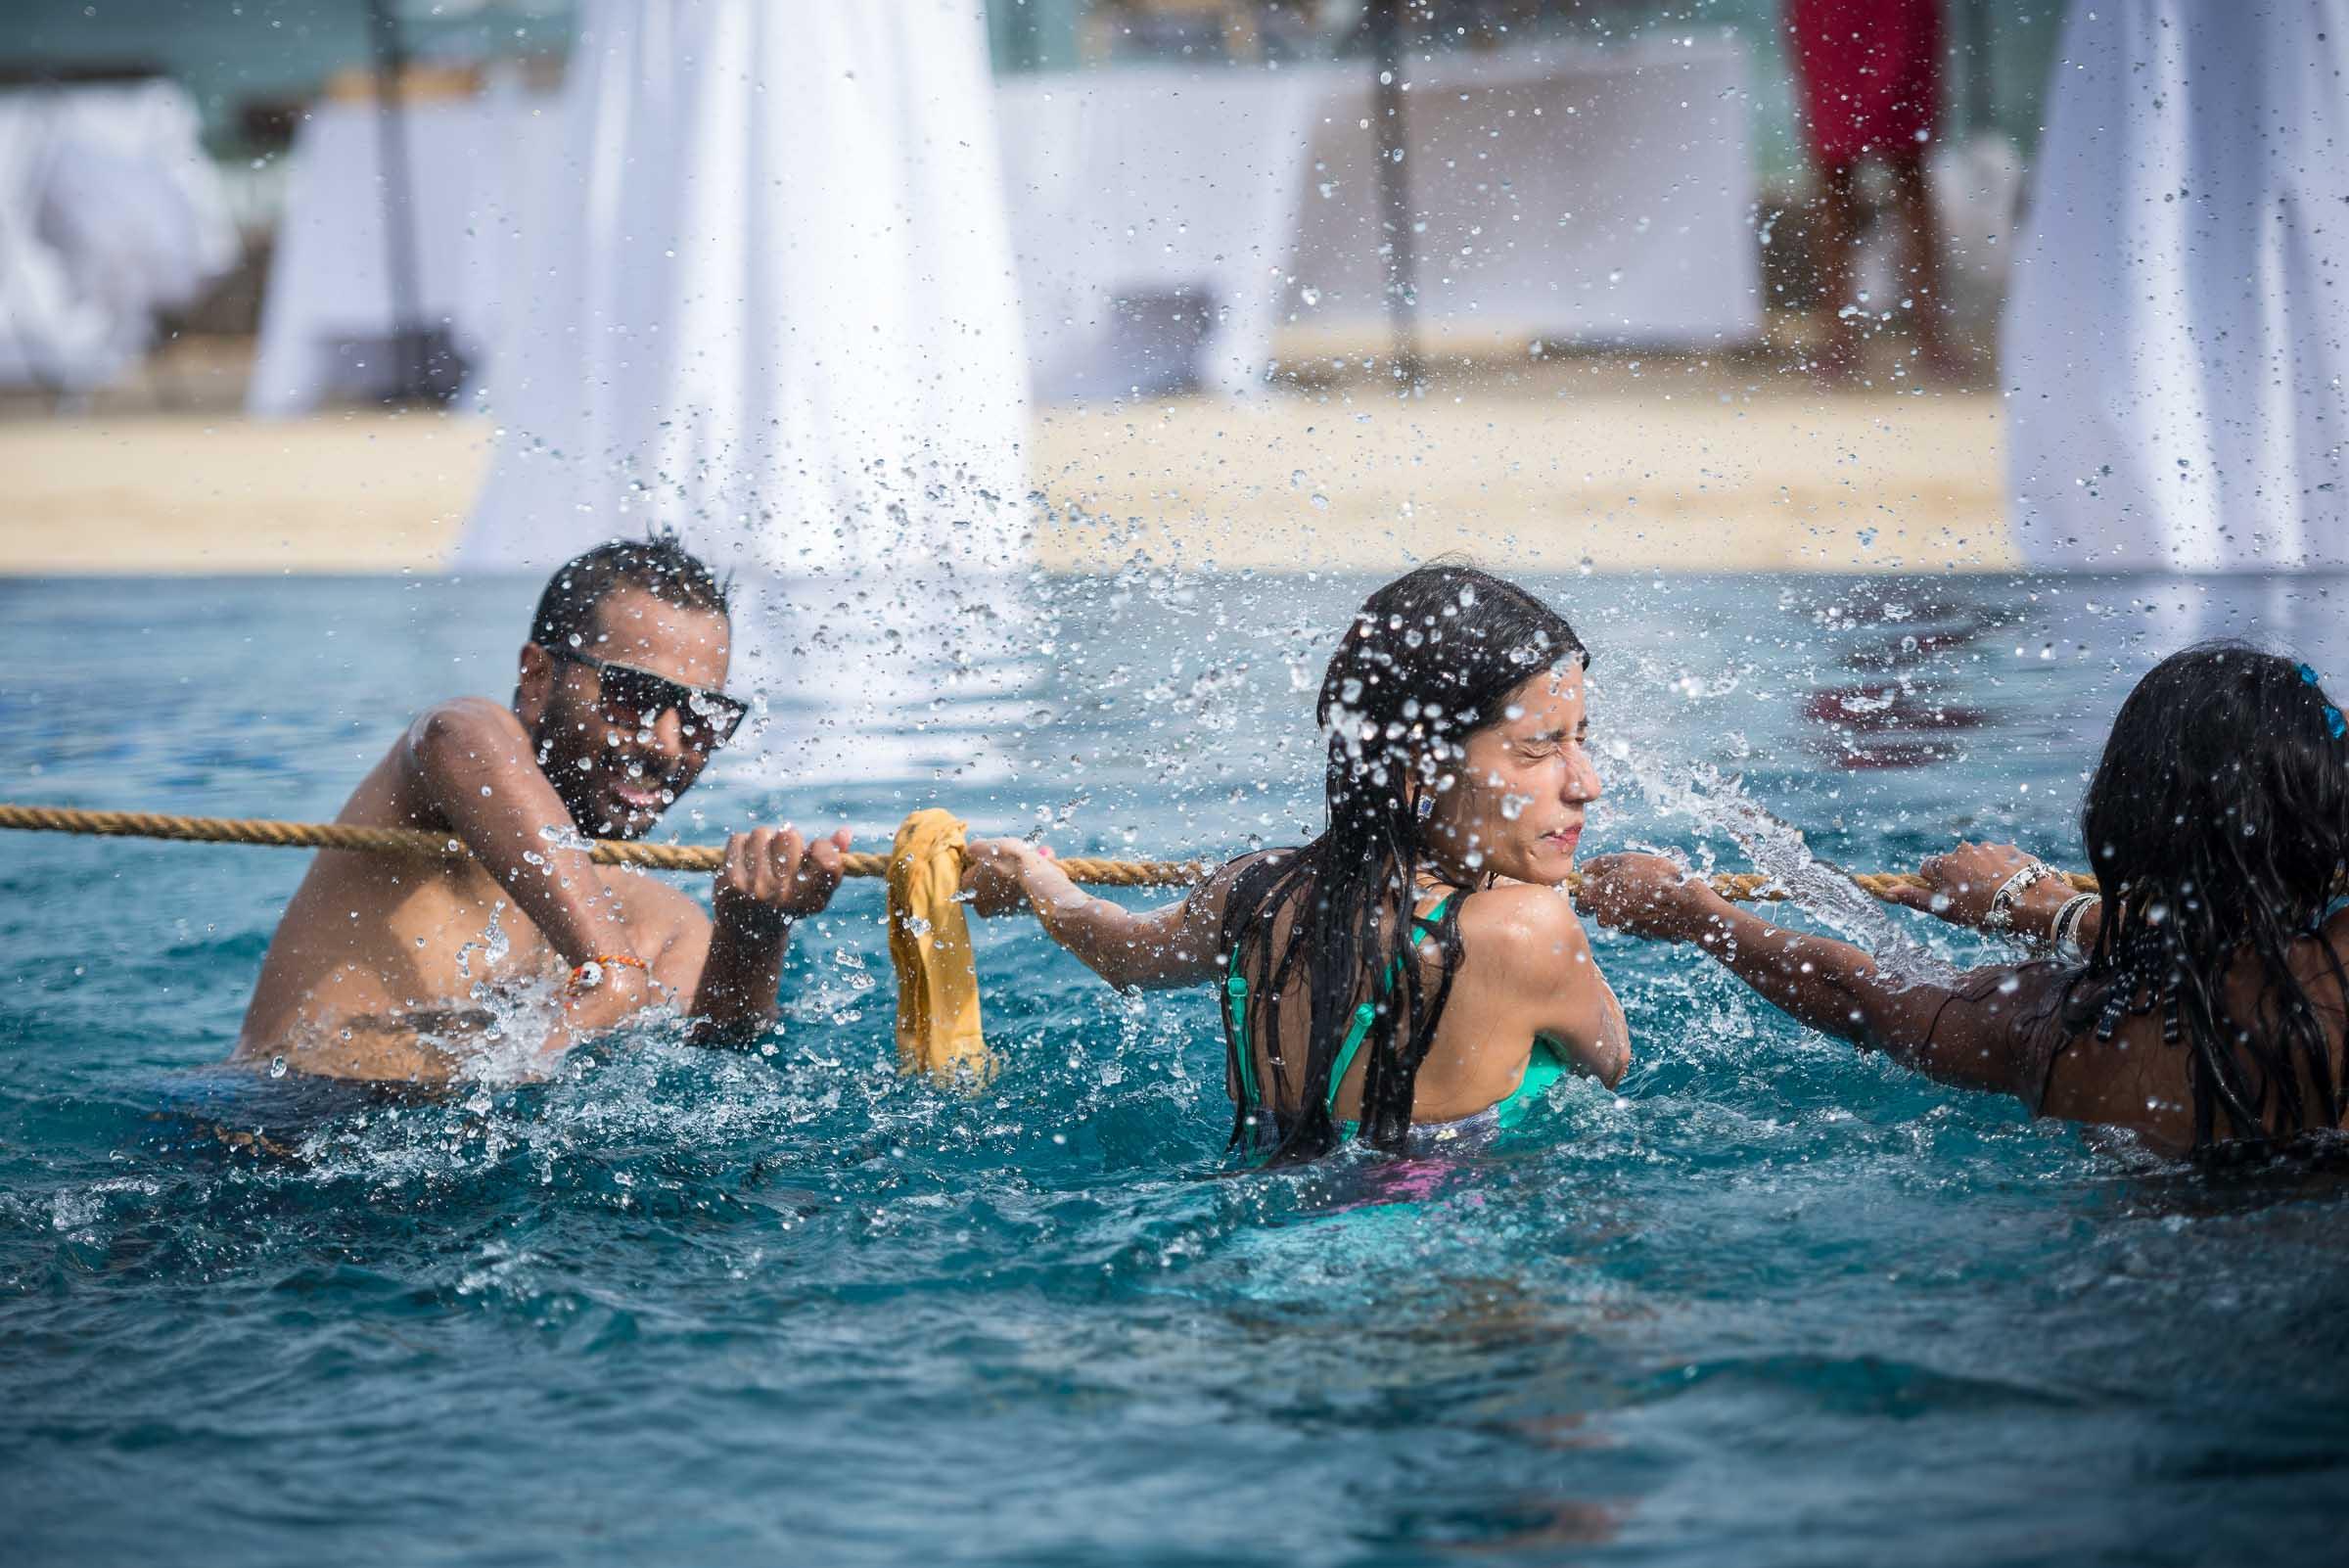 thailand-wedding-photographer-marriott-spa-resort-rayong-indian-wedding-photography-bangkok-pool-party-031